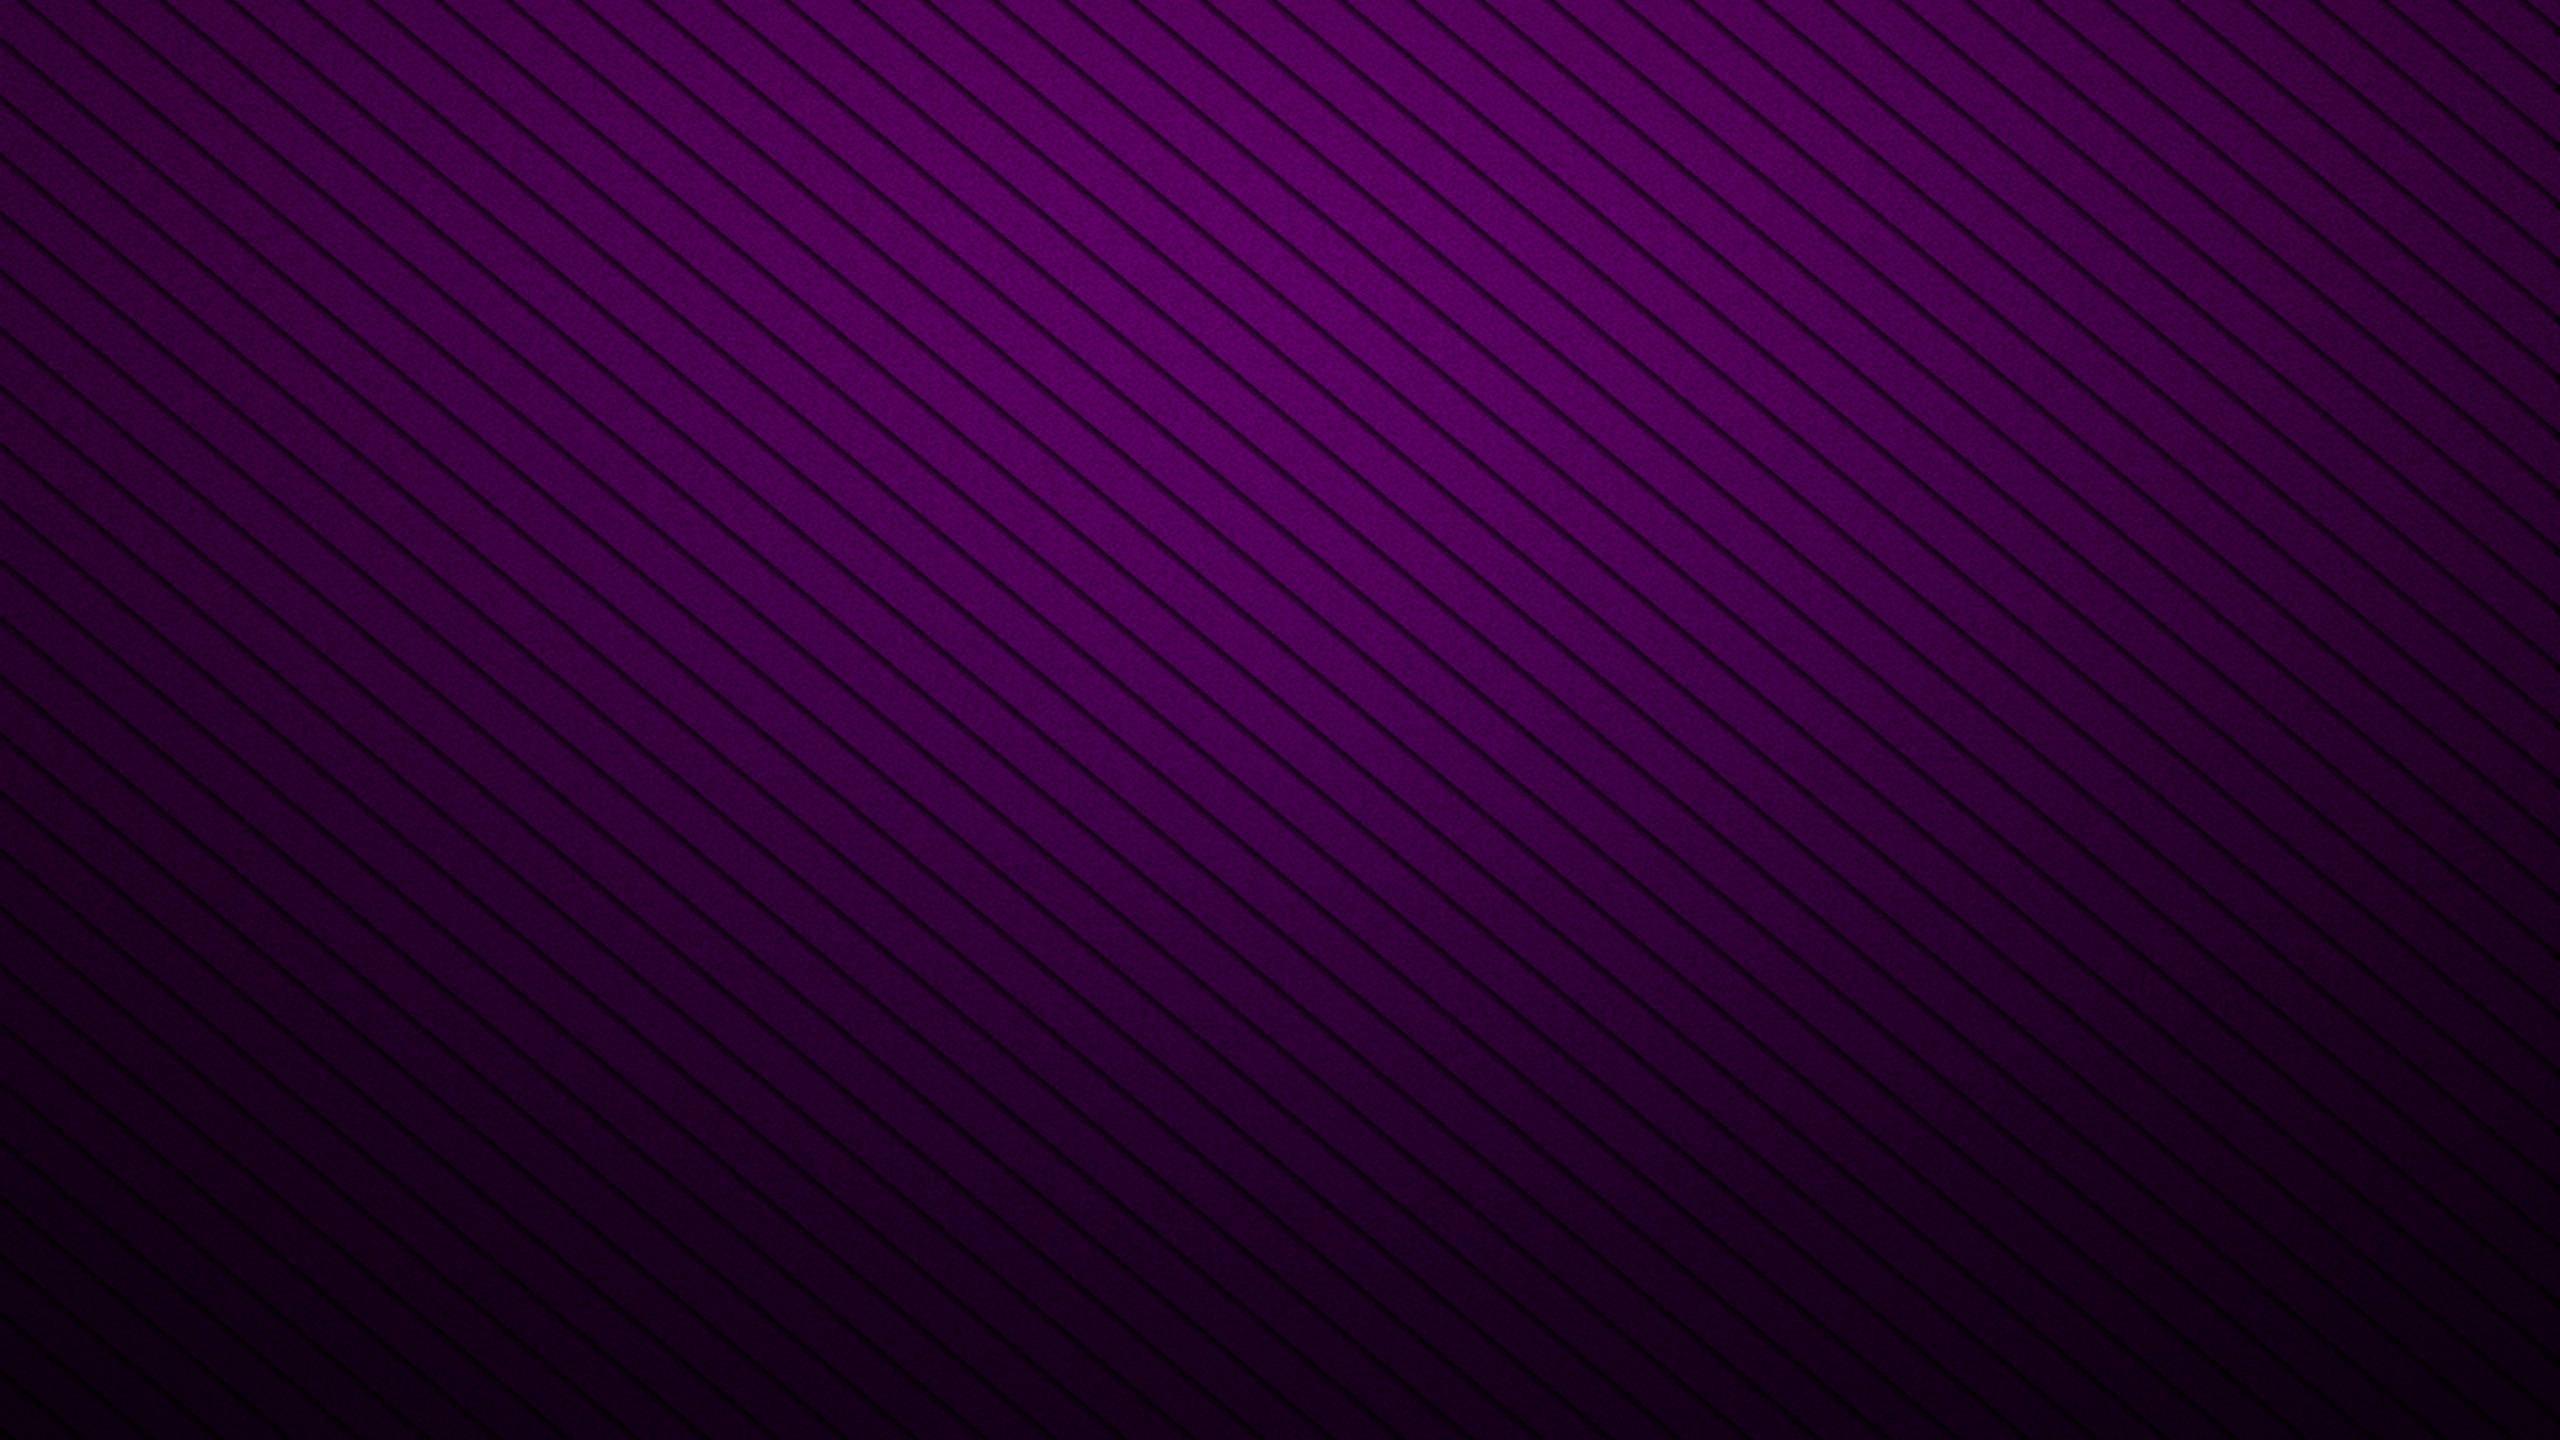 Purple And Black Wallpaper – Desktop Backgrounds